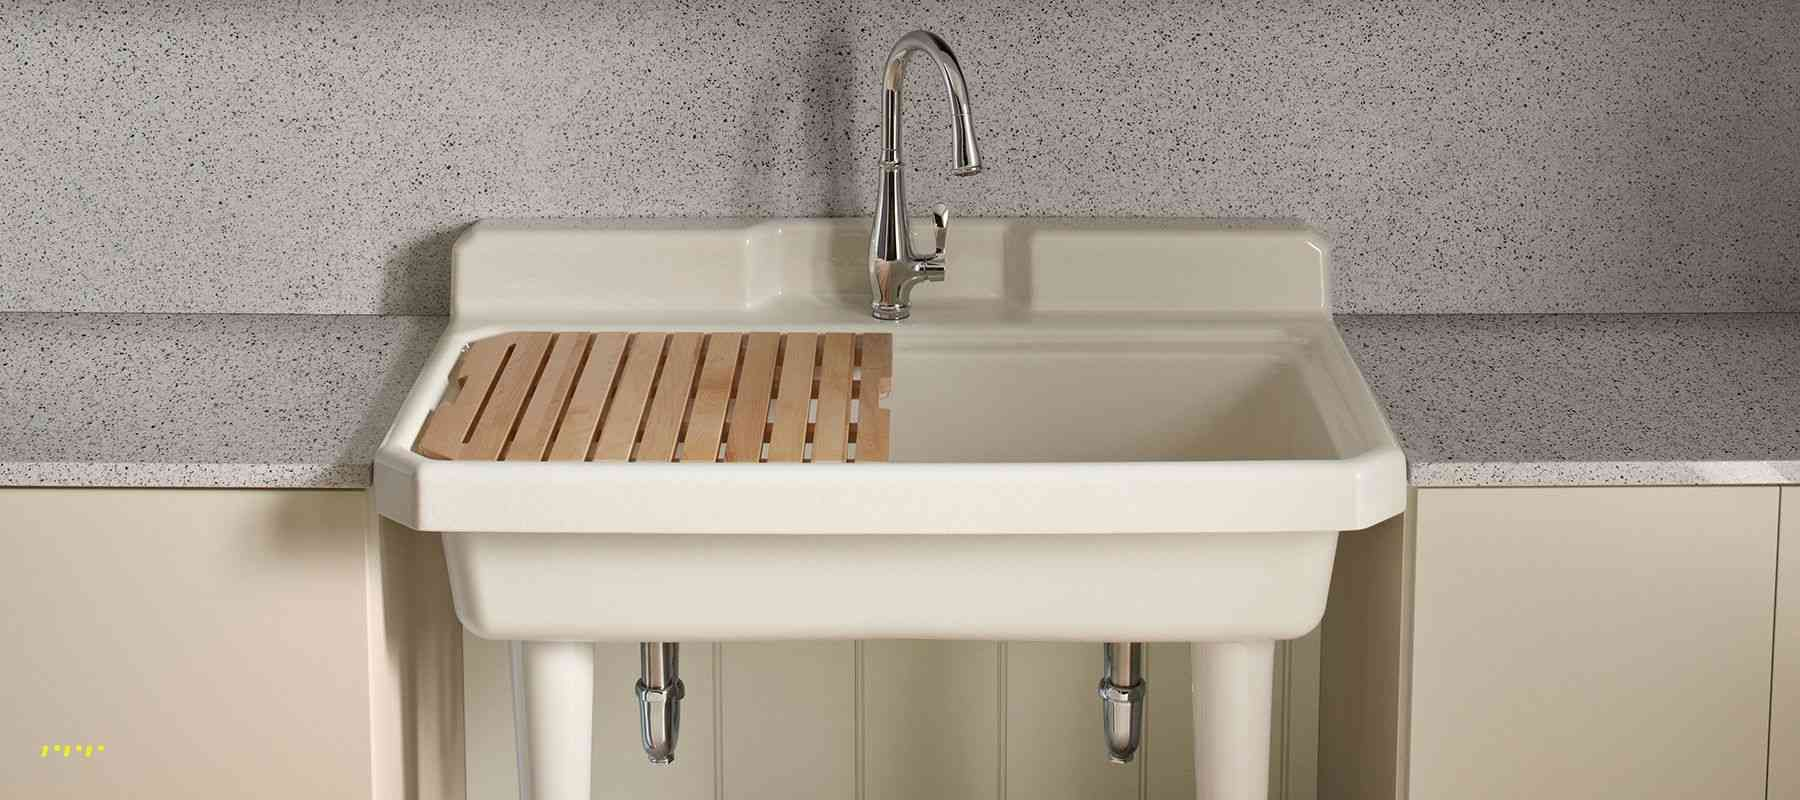 Laundry Room Undermount Sink Inspirational Utility Sinks Kitchen